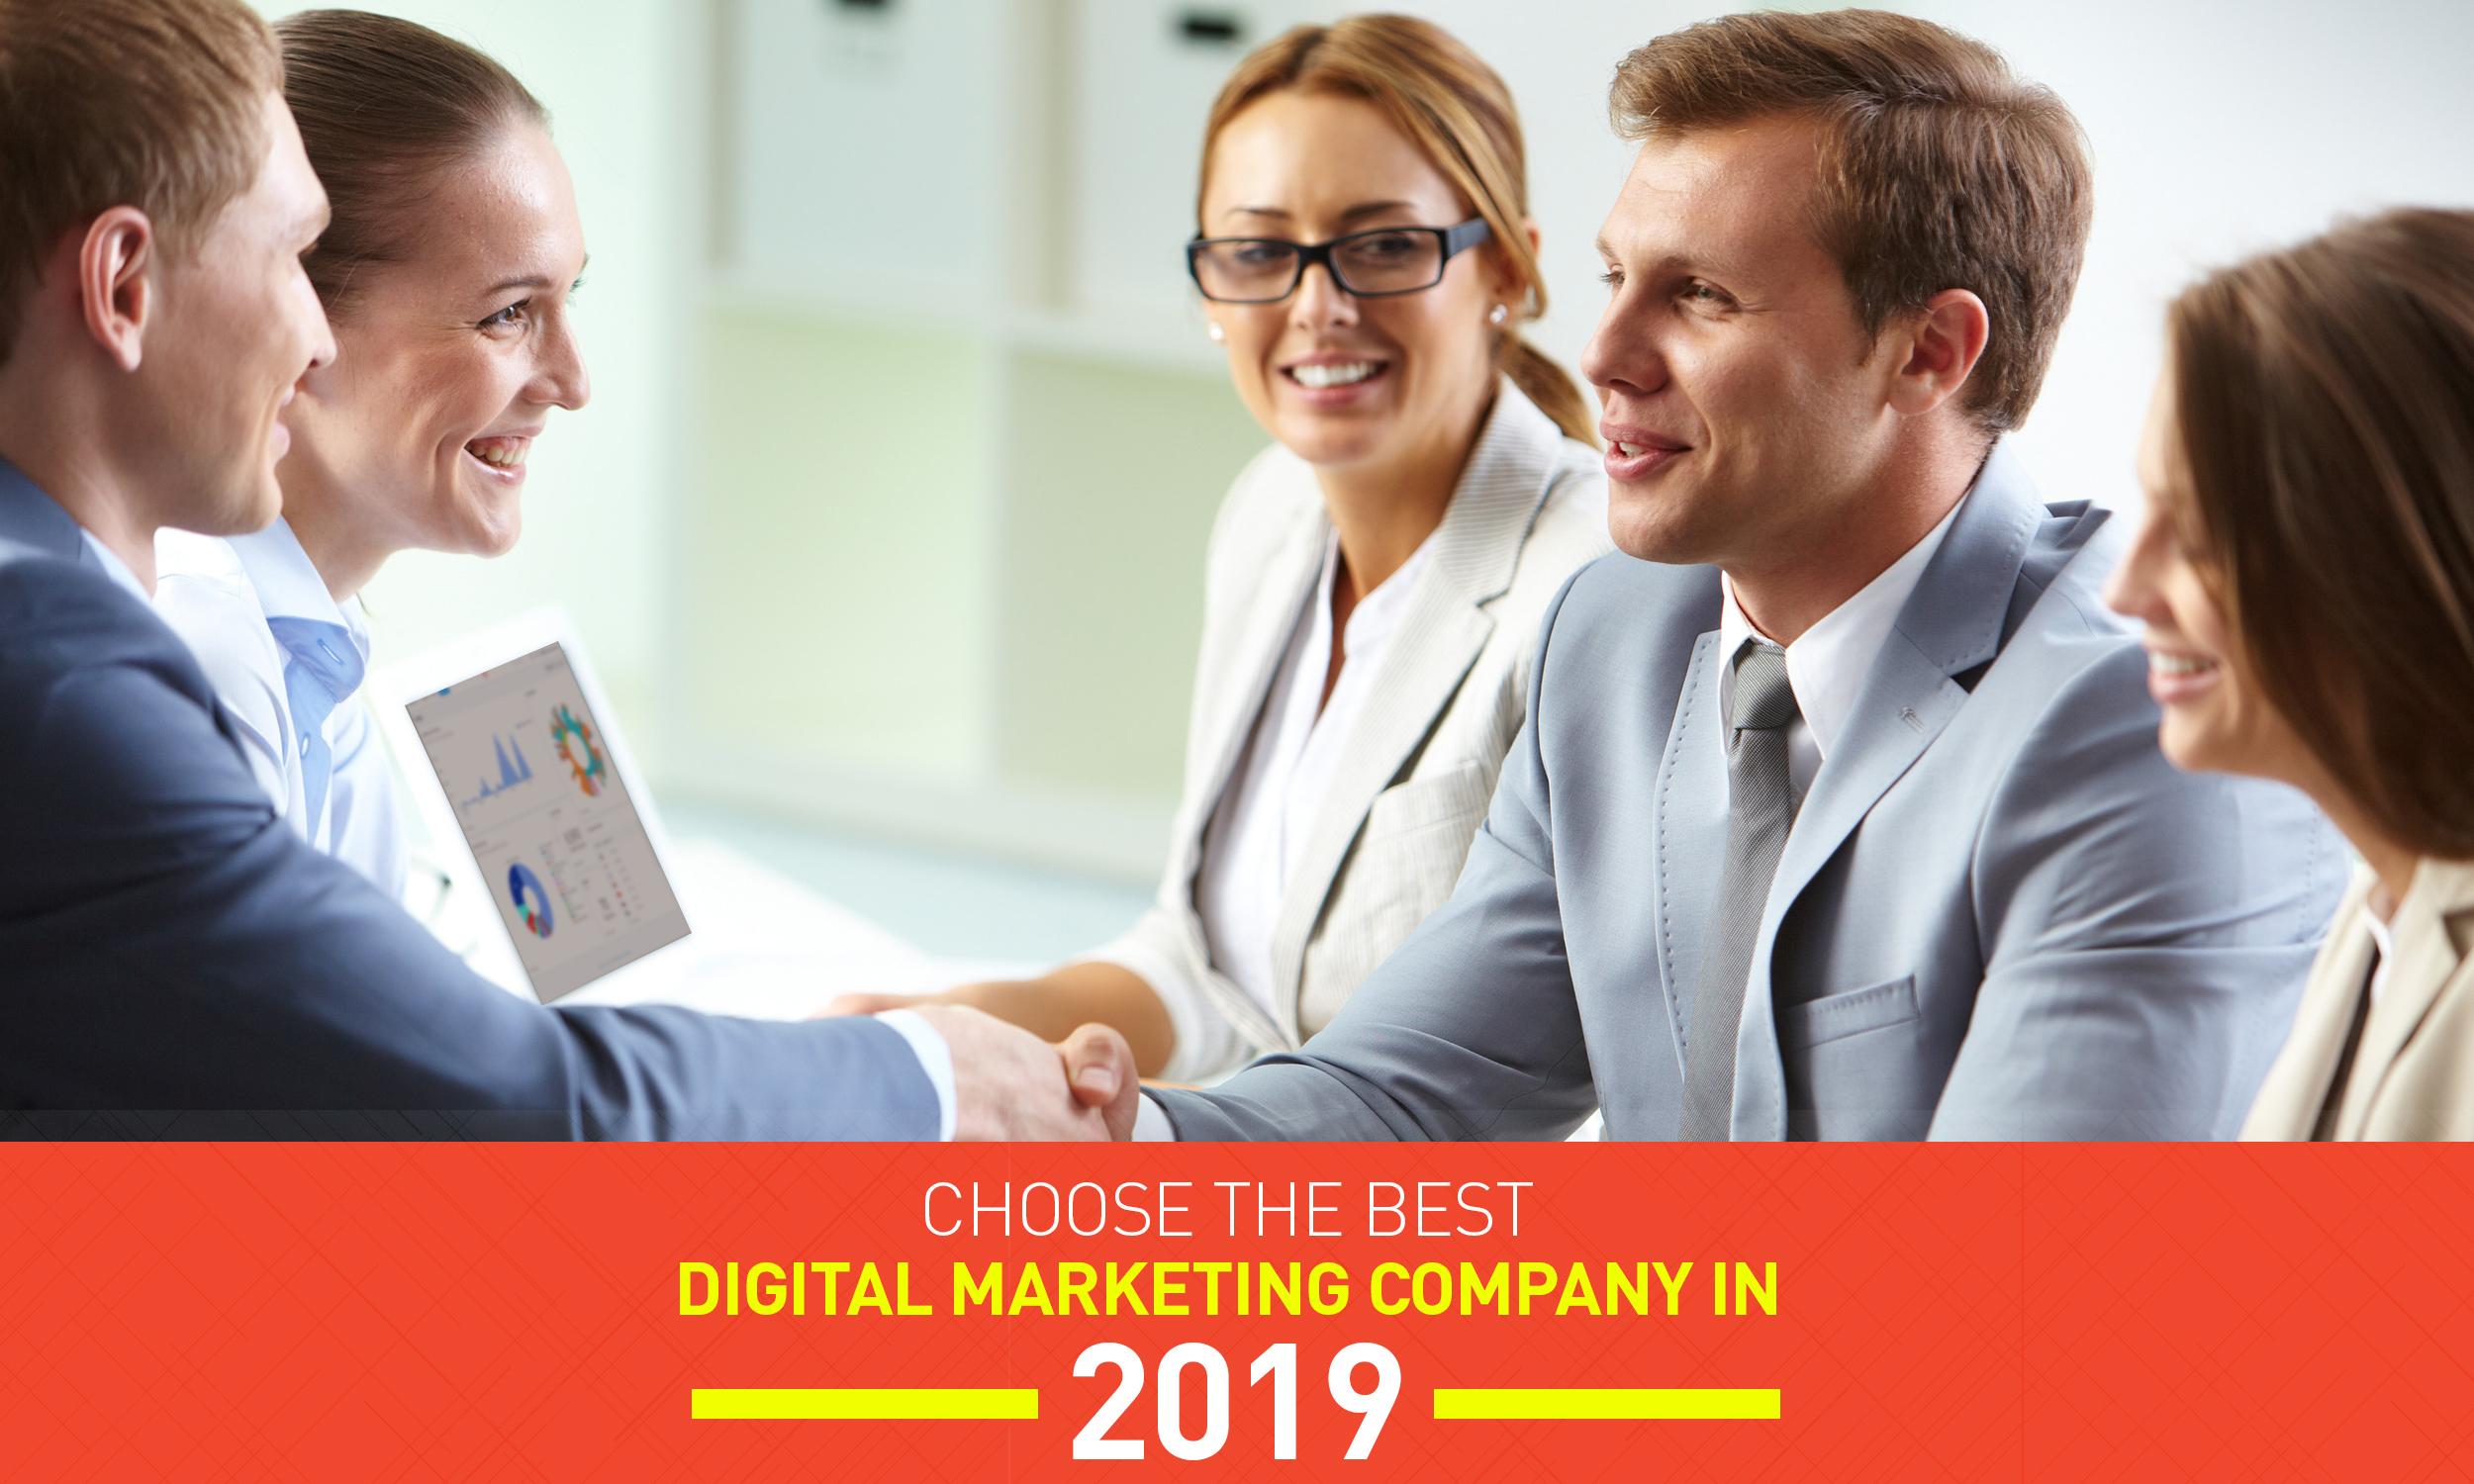 Digital Marketing Company.jpg